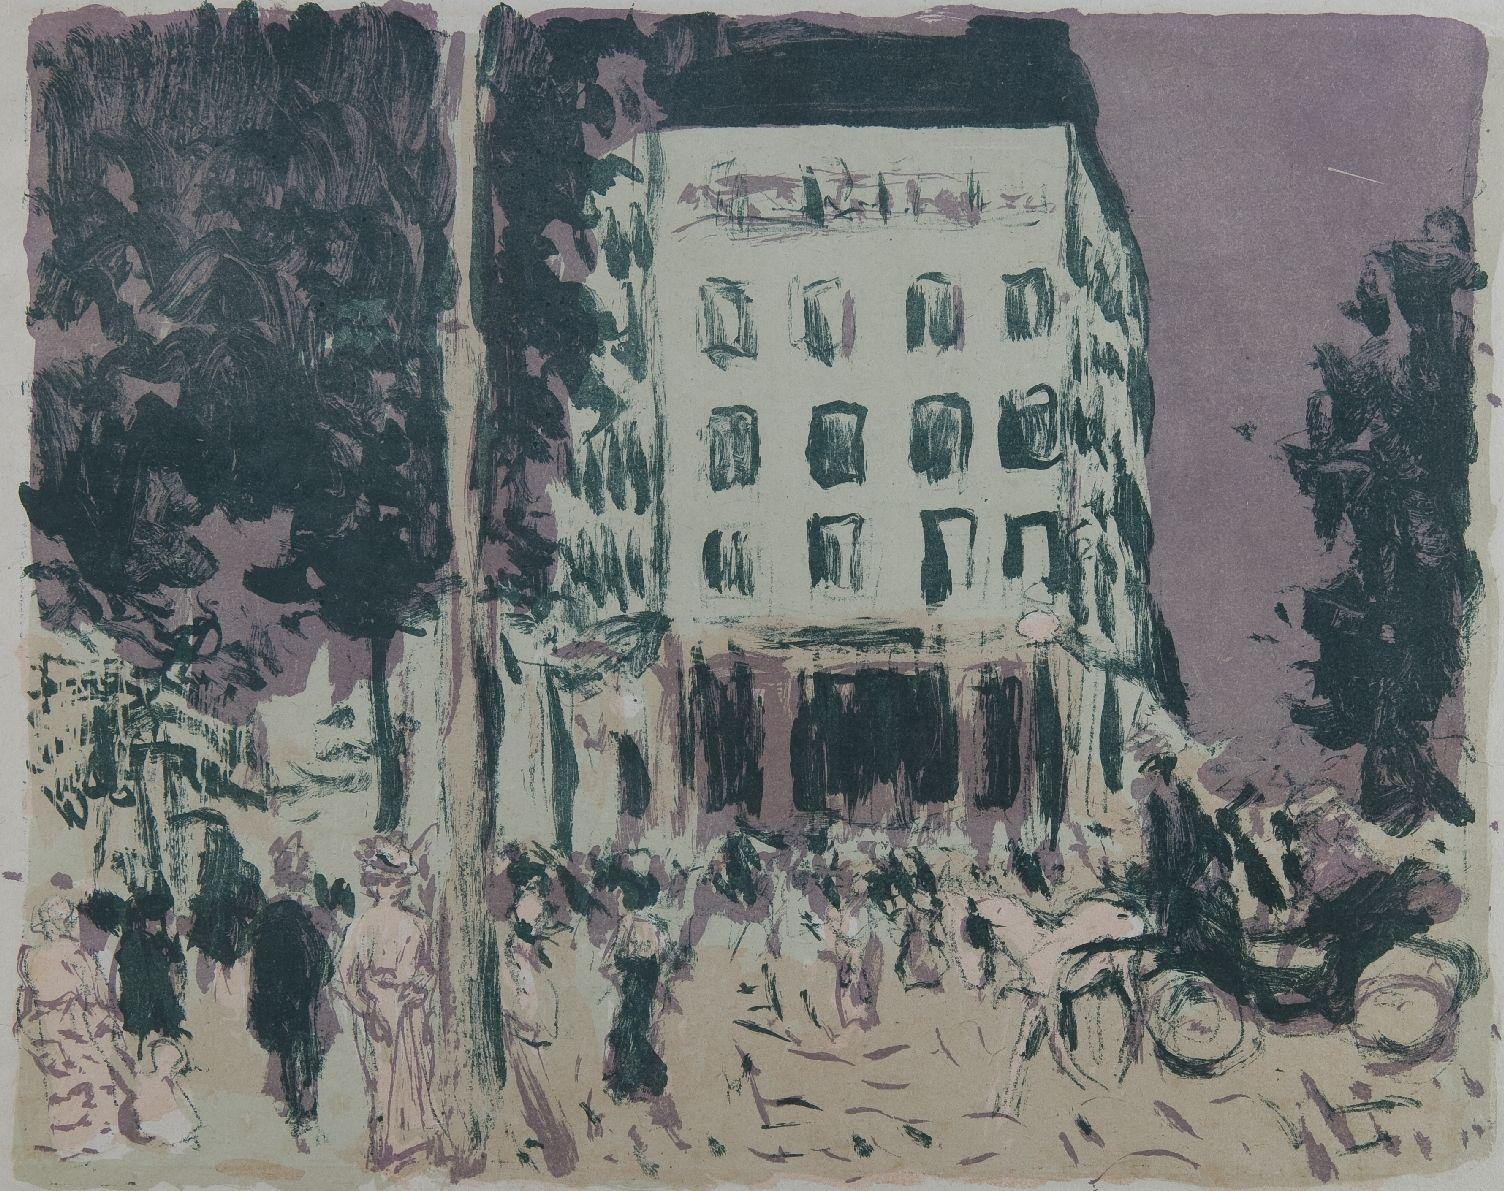 Pierre Bonnard: Les Boulevards, 1900, Farblithografie, 28,20 x 36,50 cm, Foto: Kunsthalle Mannheim/ Kathrin Schwab